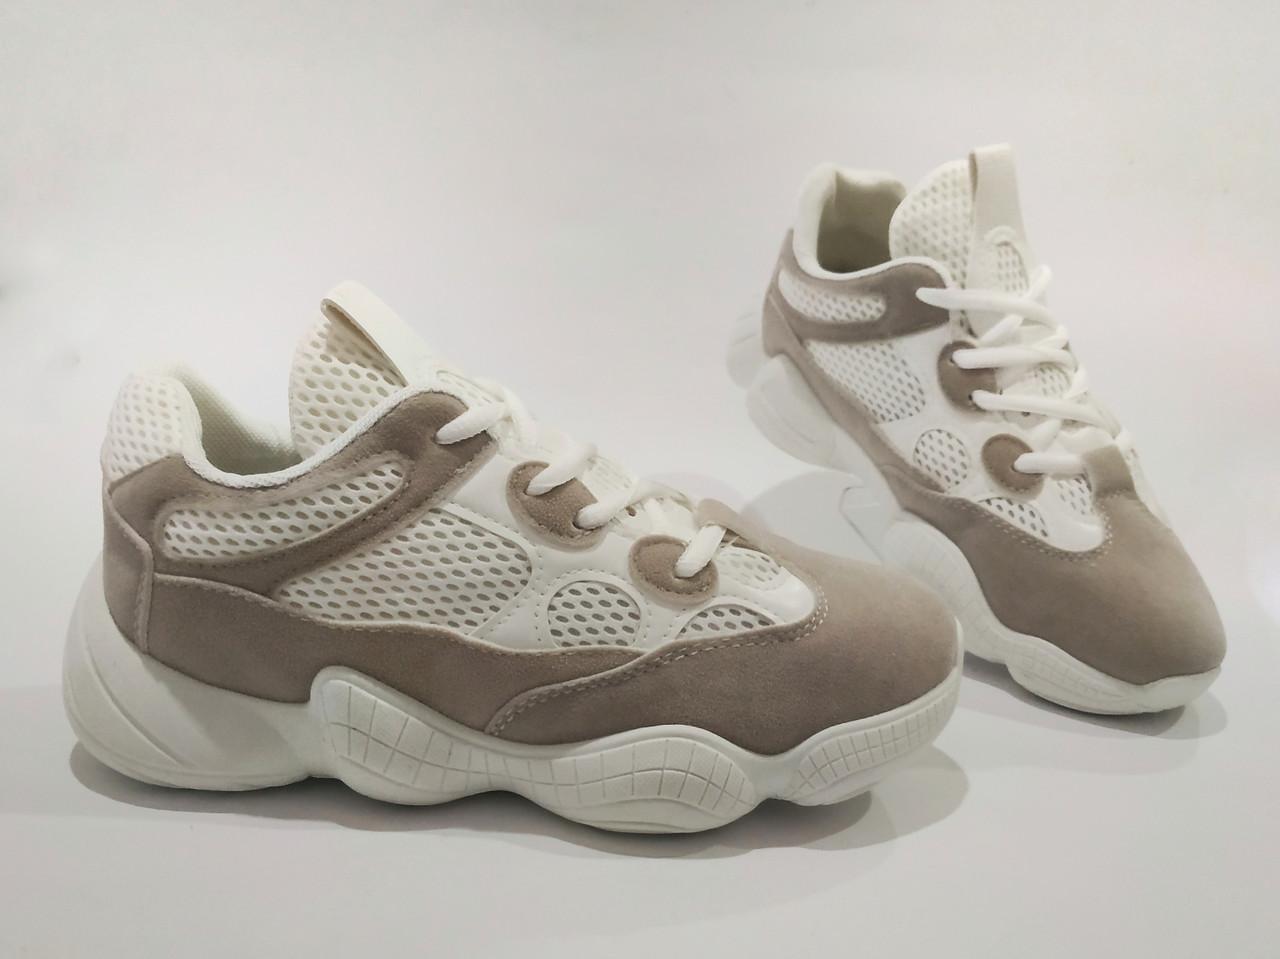 save off 6d713 e78f2 Adidas Yeezy 500 БЕЛЫЕ |КОПИЯ| женские кроссовки адидас изи 500 \ размеры:  36-41